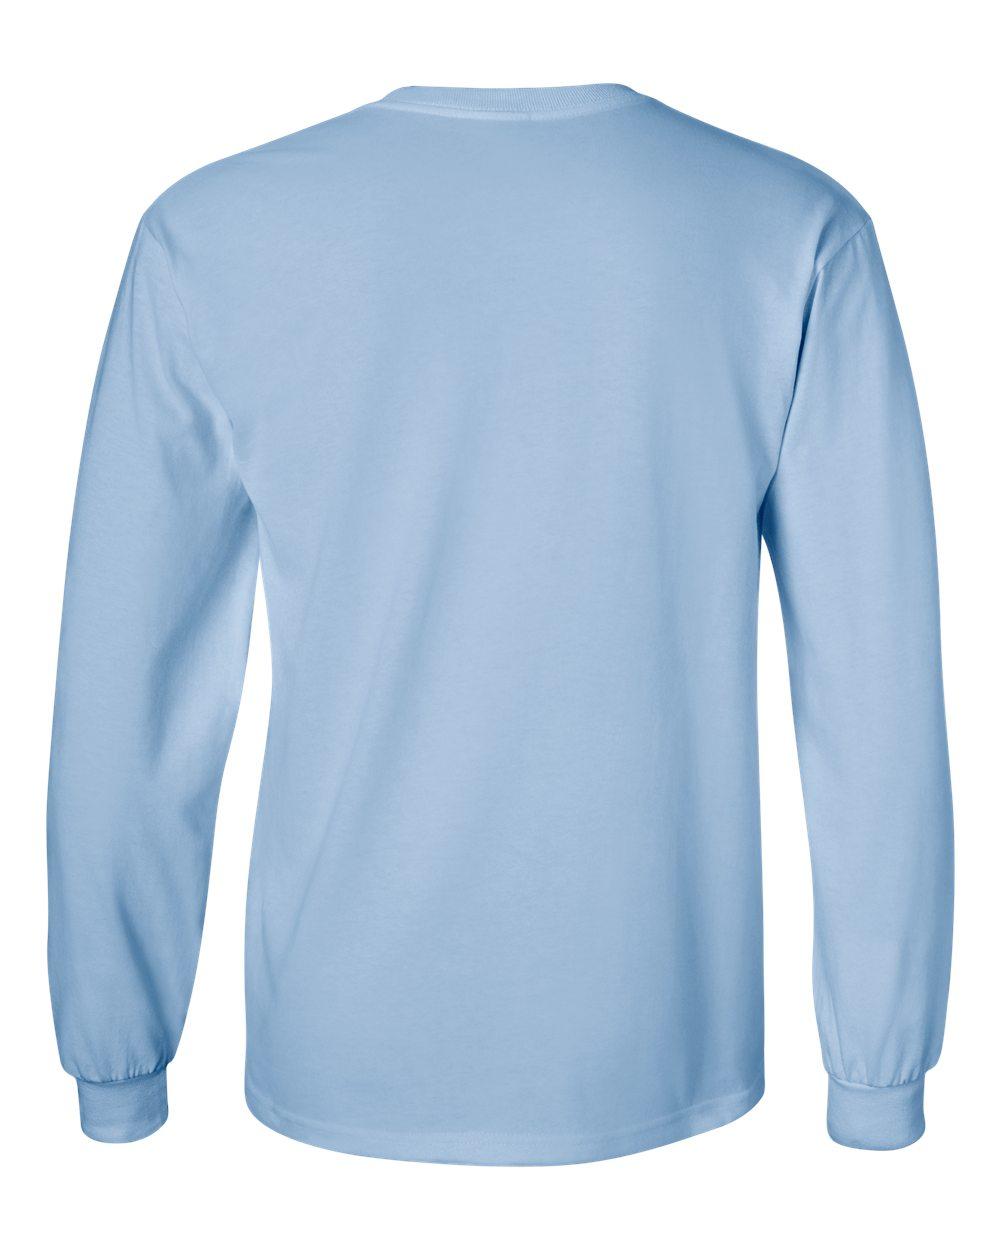 Gildan-Men-039-s-Ultra-Cotton-6-oz-Long-Sleeve-T-Shirt-G240-S-5XL thumbnail 48